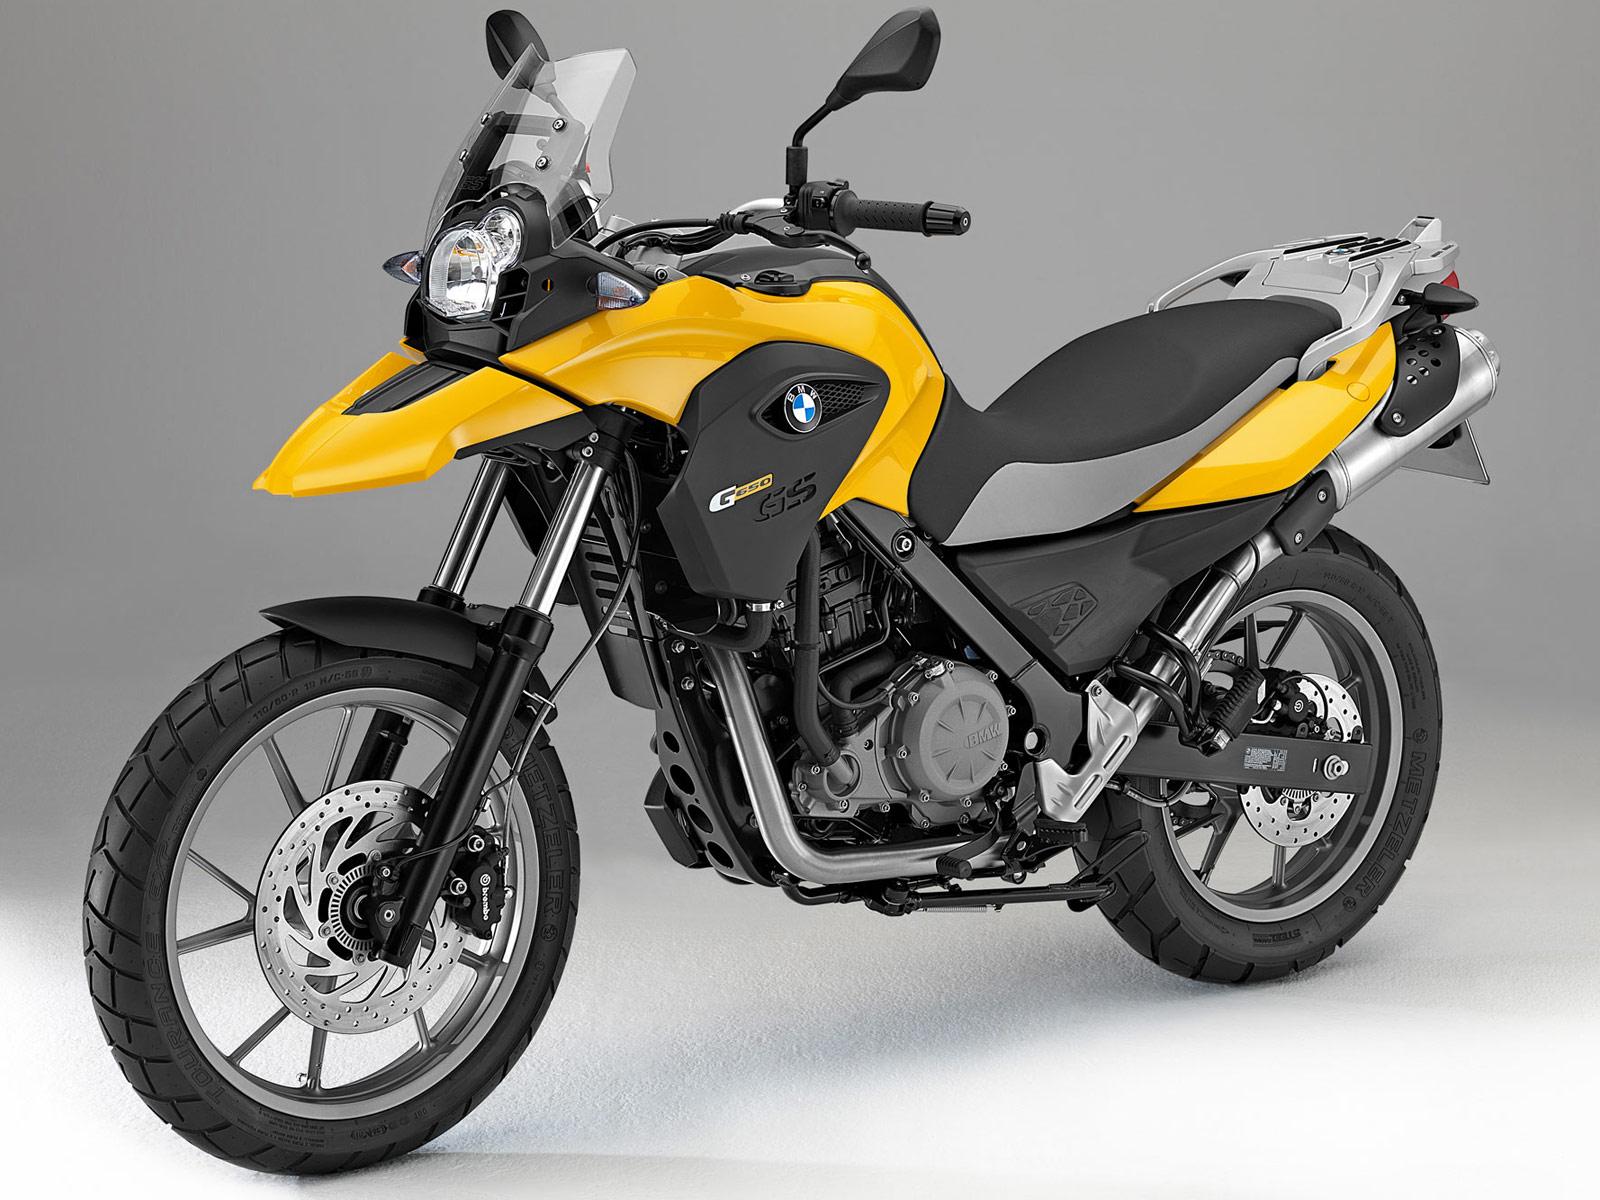 2013 bmw g650gs motorcycle insurance information. Black Bedroom Furniture Sets. Home Design Ideas